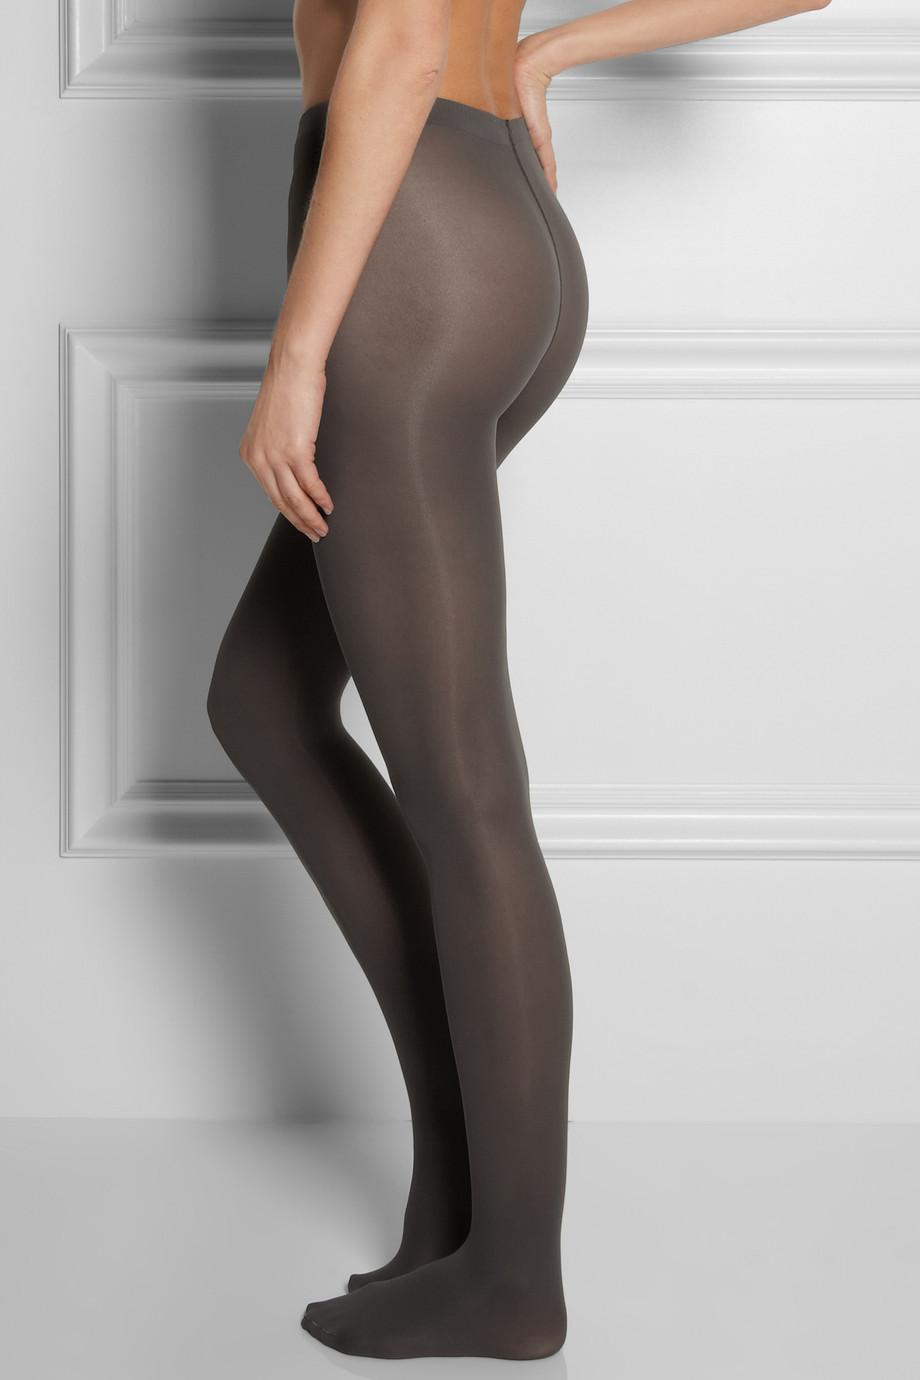 Buy Cheap New Styles Free Shipping Nicekicks Womens Pure Shine 80 DEN 80 DEN Tights Falke tPfyRv